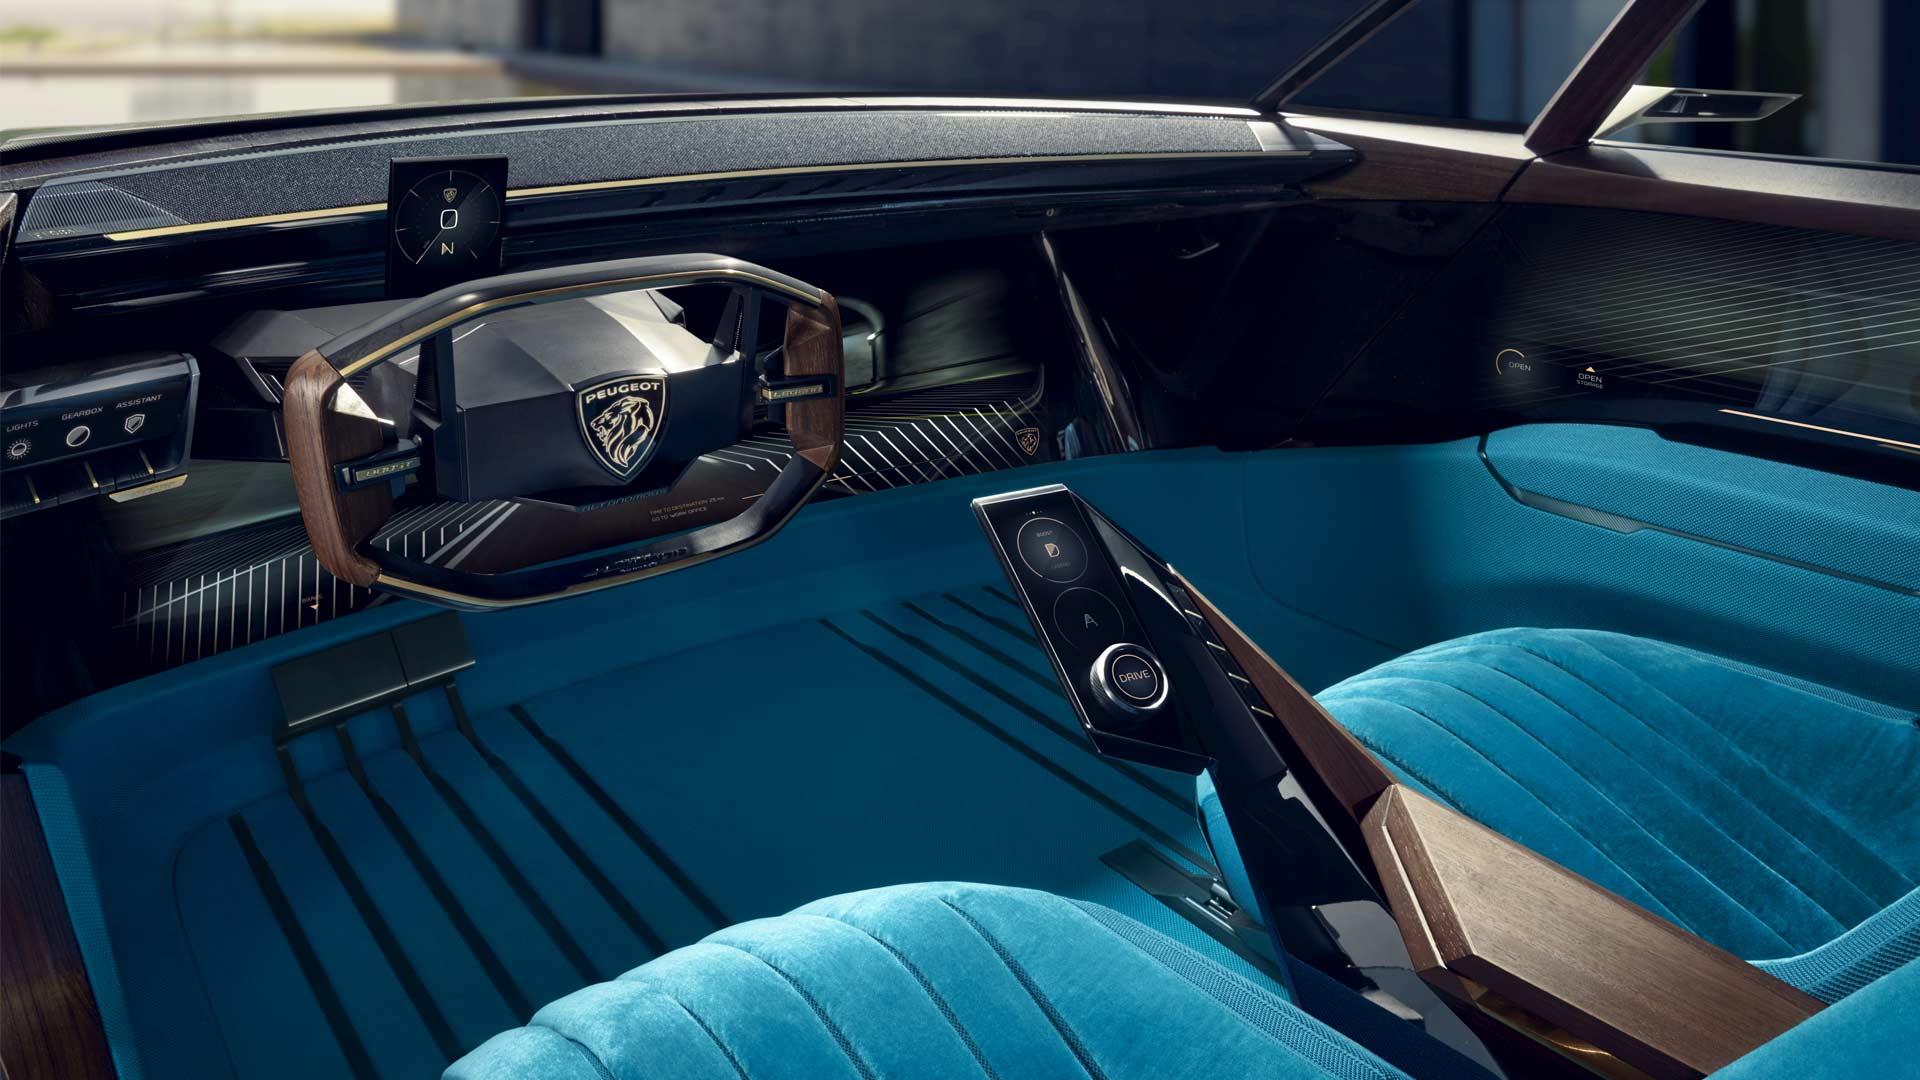 Peugeot-e-Legend-Concept-Interior_3